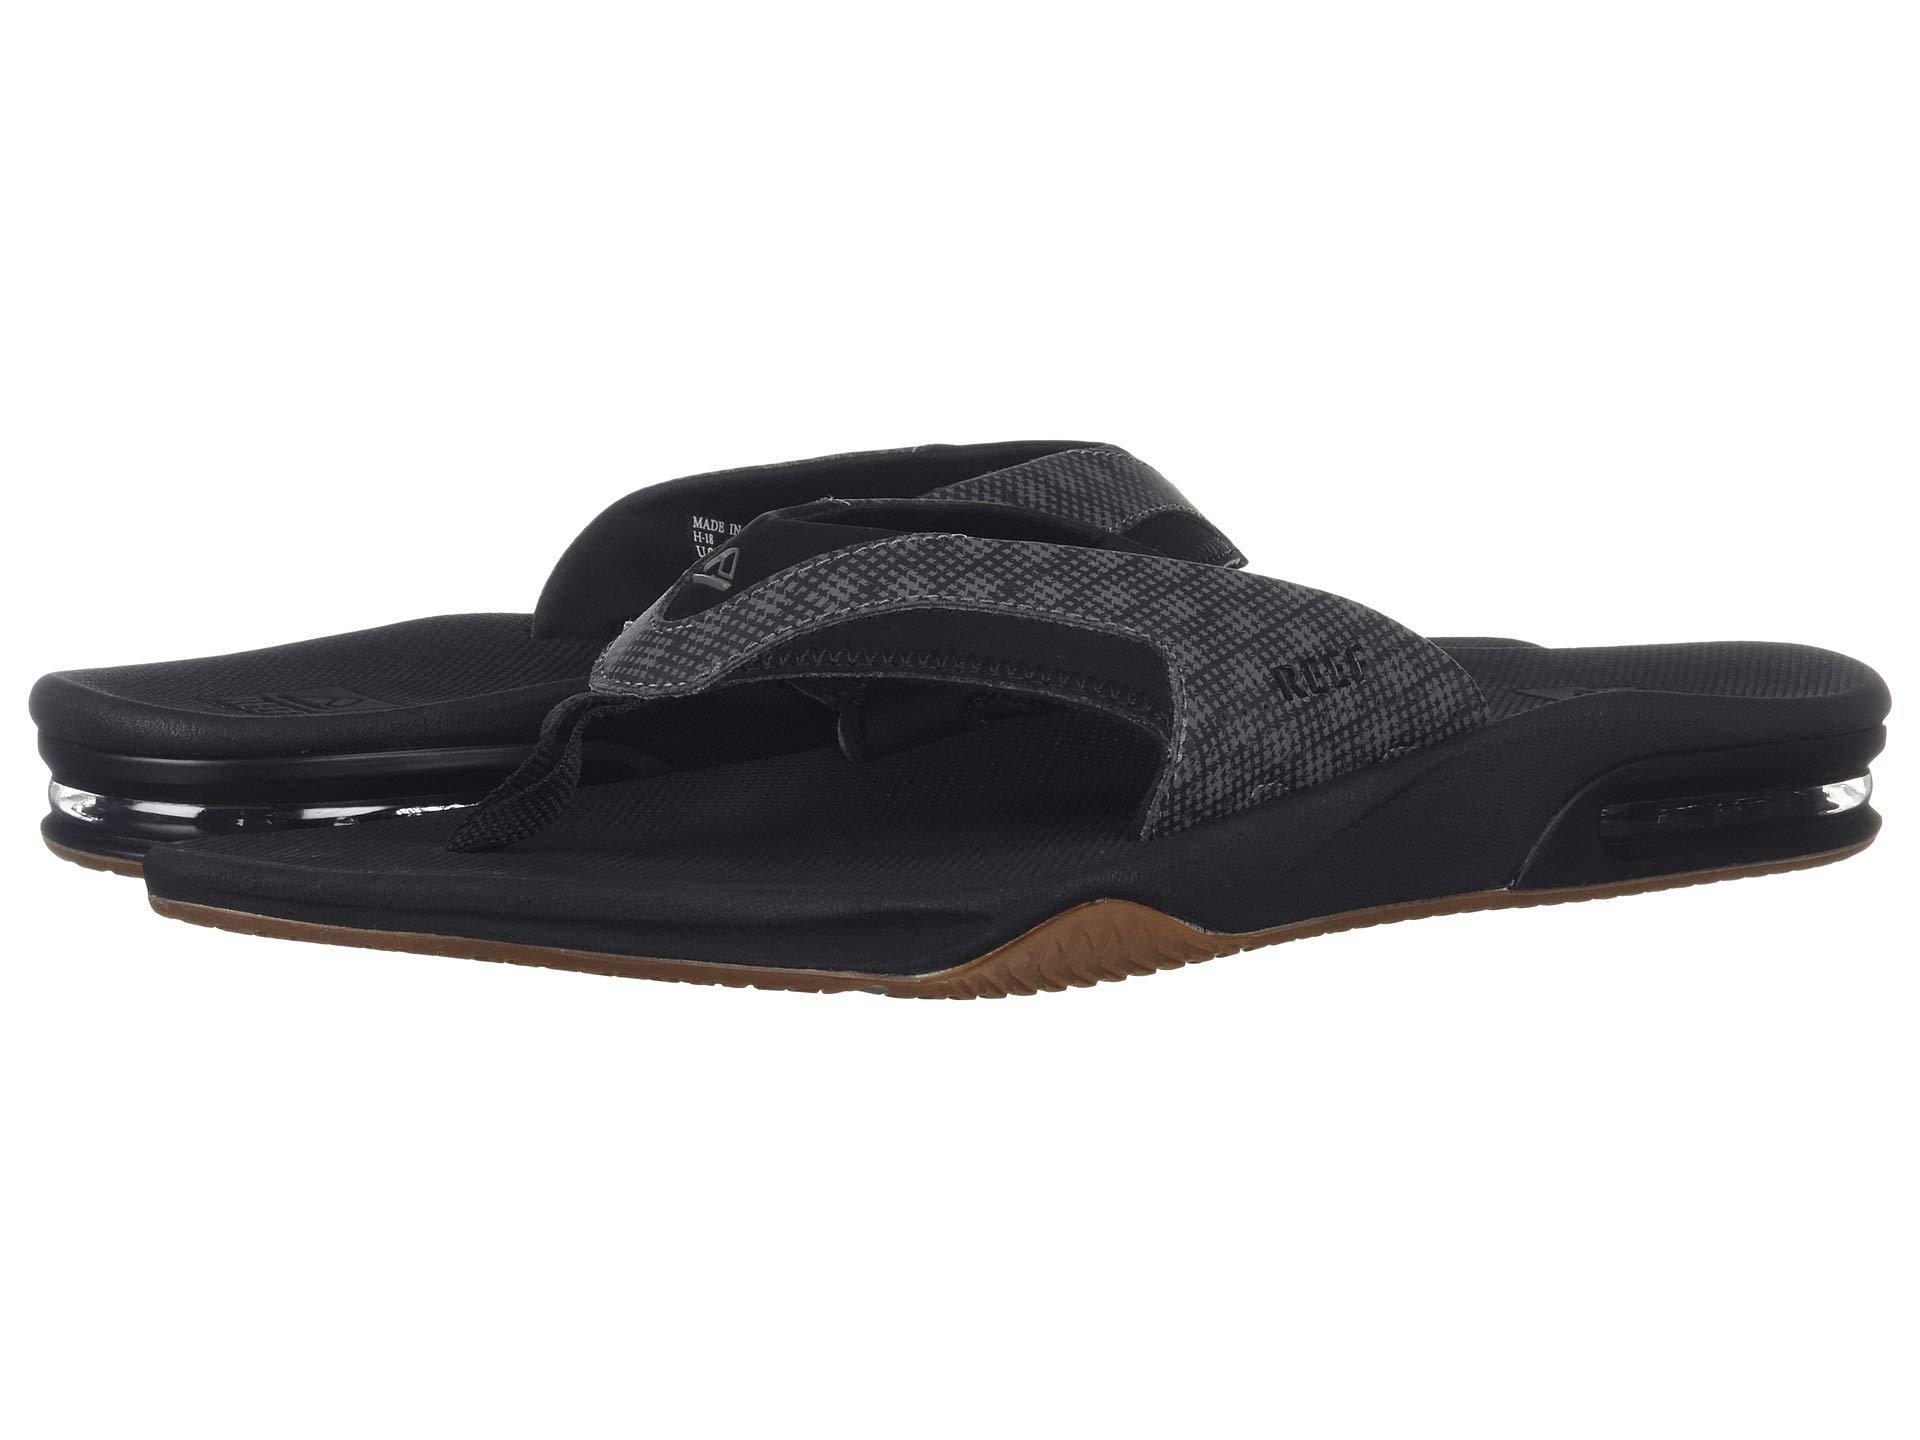 00193520e04f Lyst - Reef Fanning Prints (black Hound) Men s Sandals in Black for Men